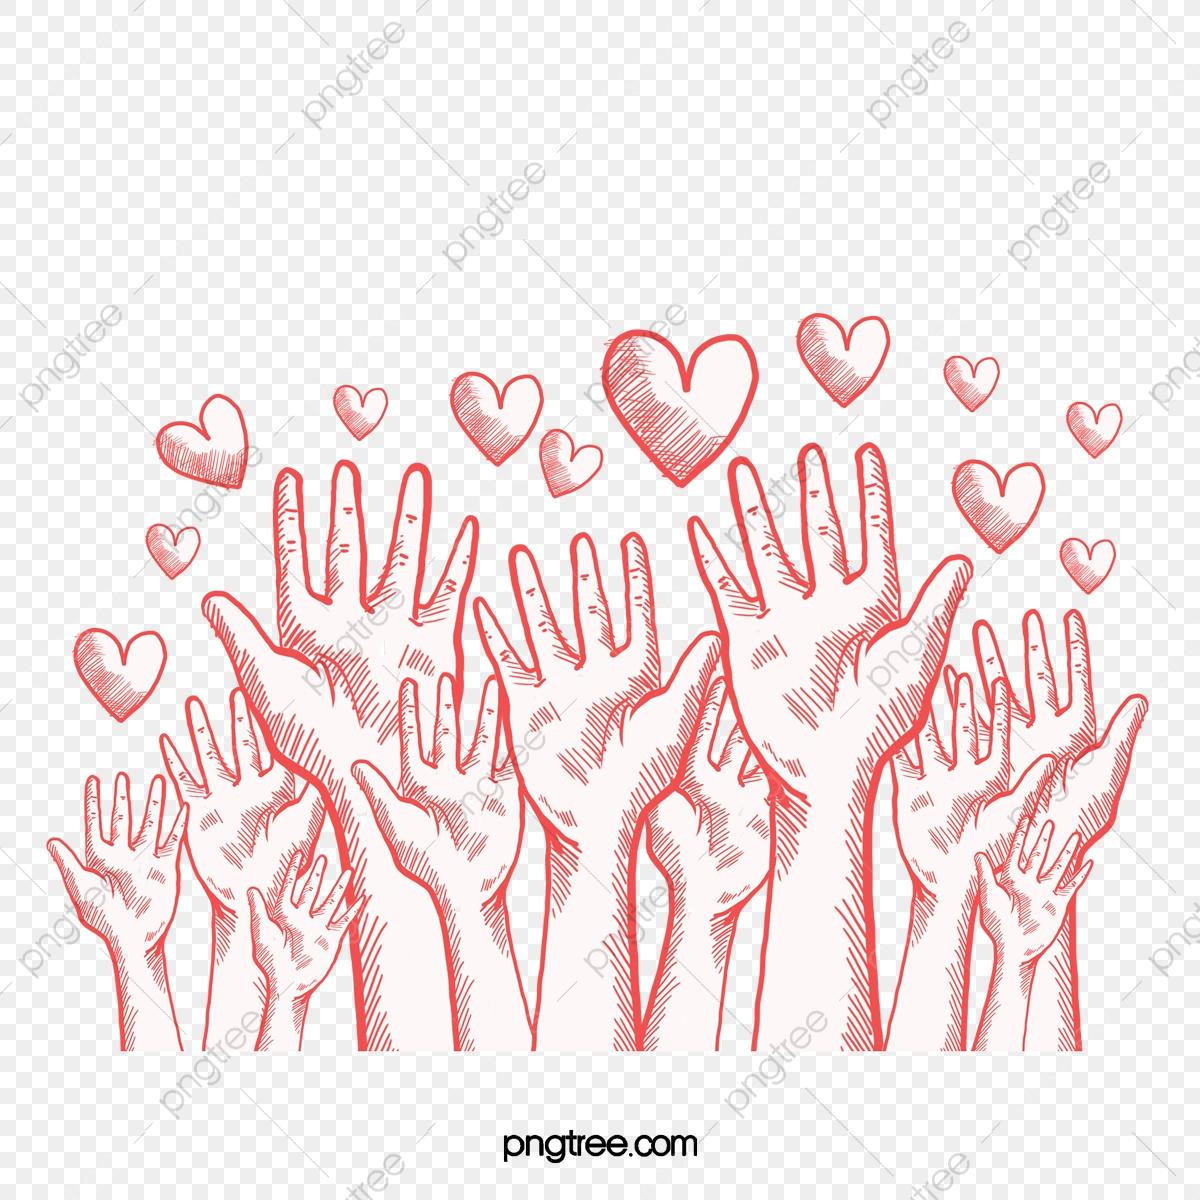 True Energy Love, Hand, Unite, Positive Energy PNG.